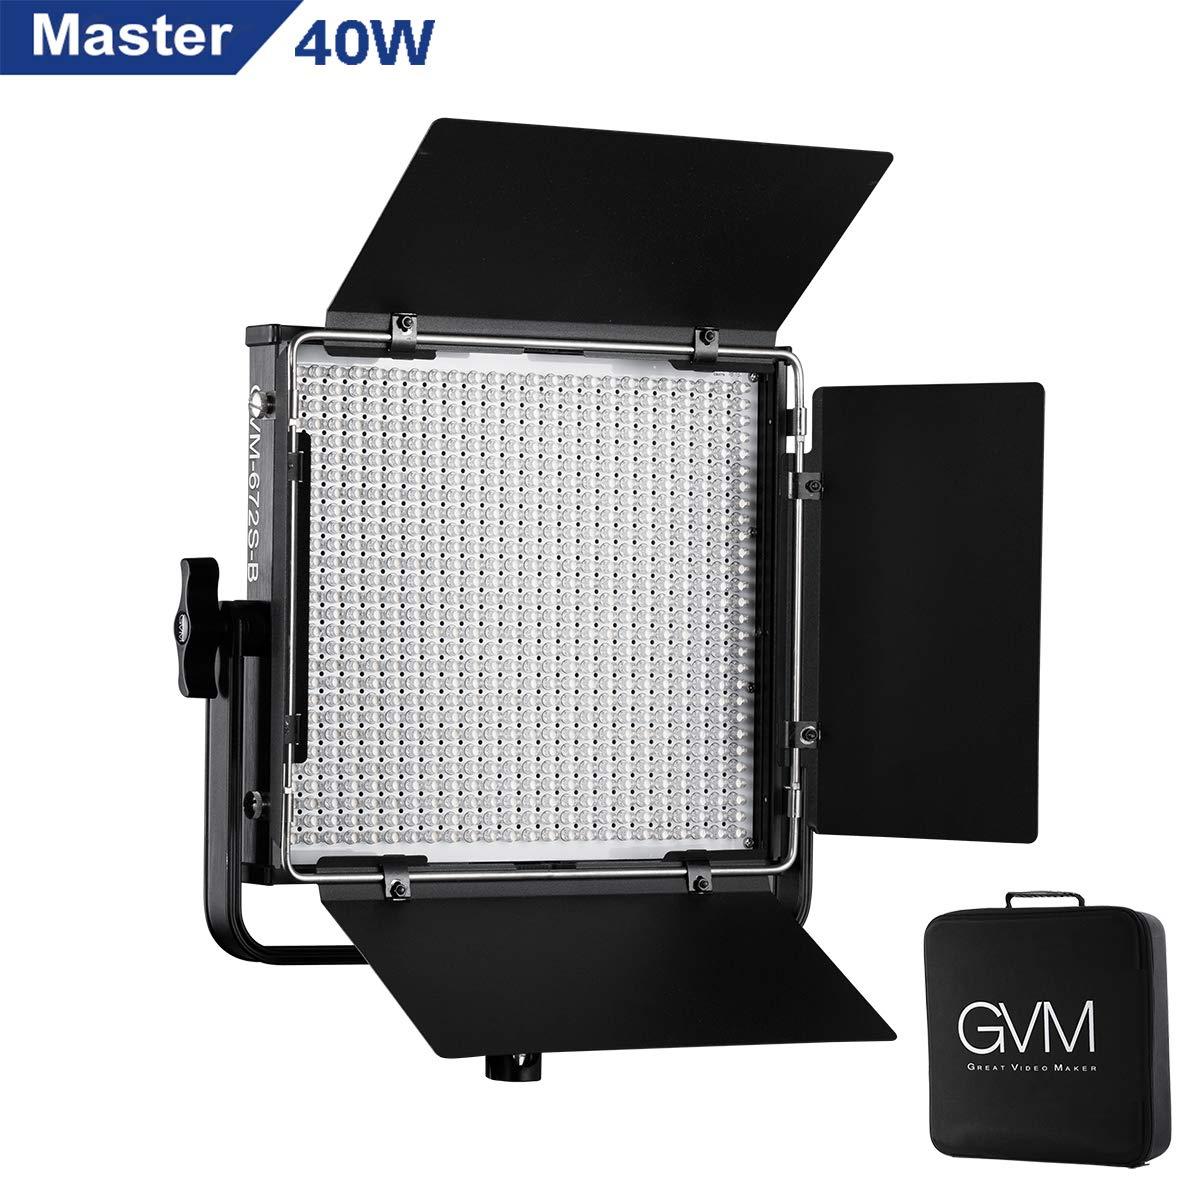 GVM 672S Master Series LED Video Lighting CRI97+ Bi-Color 3200K-5600K Dimmable LED Video Light Panel for Studio Portrait Photography Outdoor Interview Lighting by GVM Great Video Maker